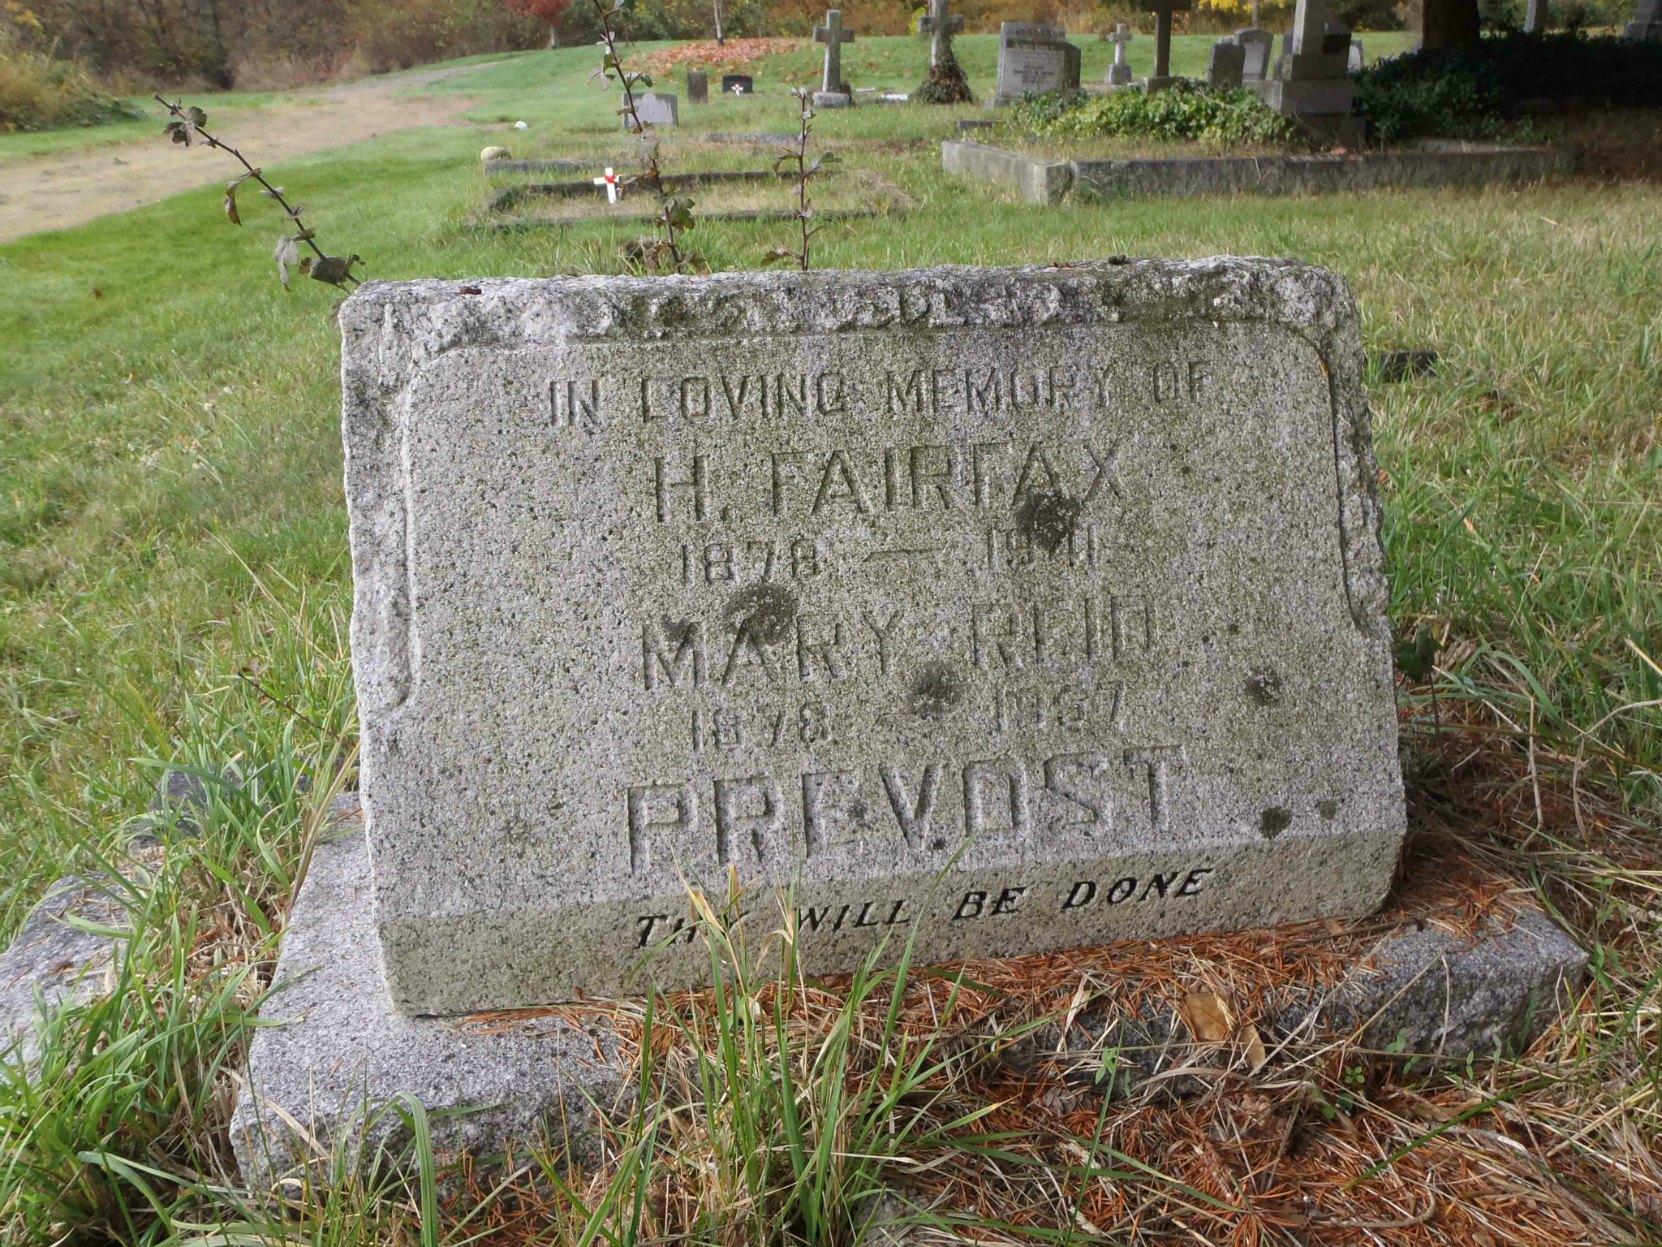 Harold Fairfax Prevost and Mary Reid Prevost grave, St. Peter's Quamichan cemetery